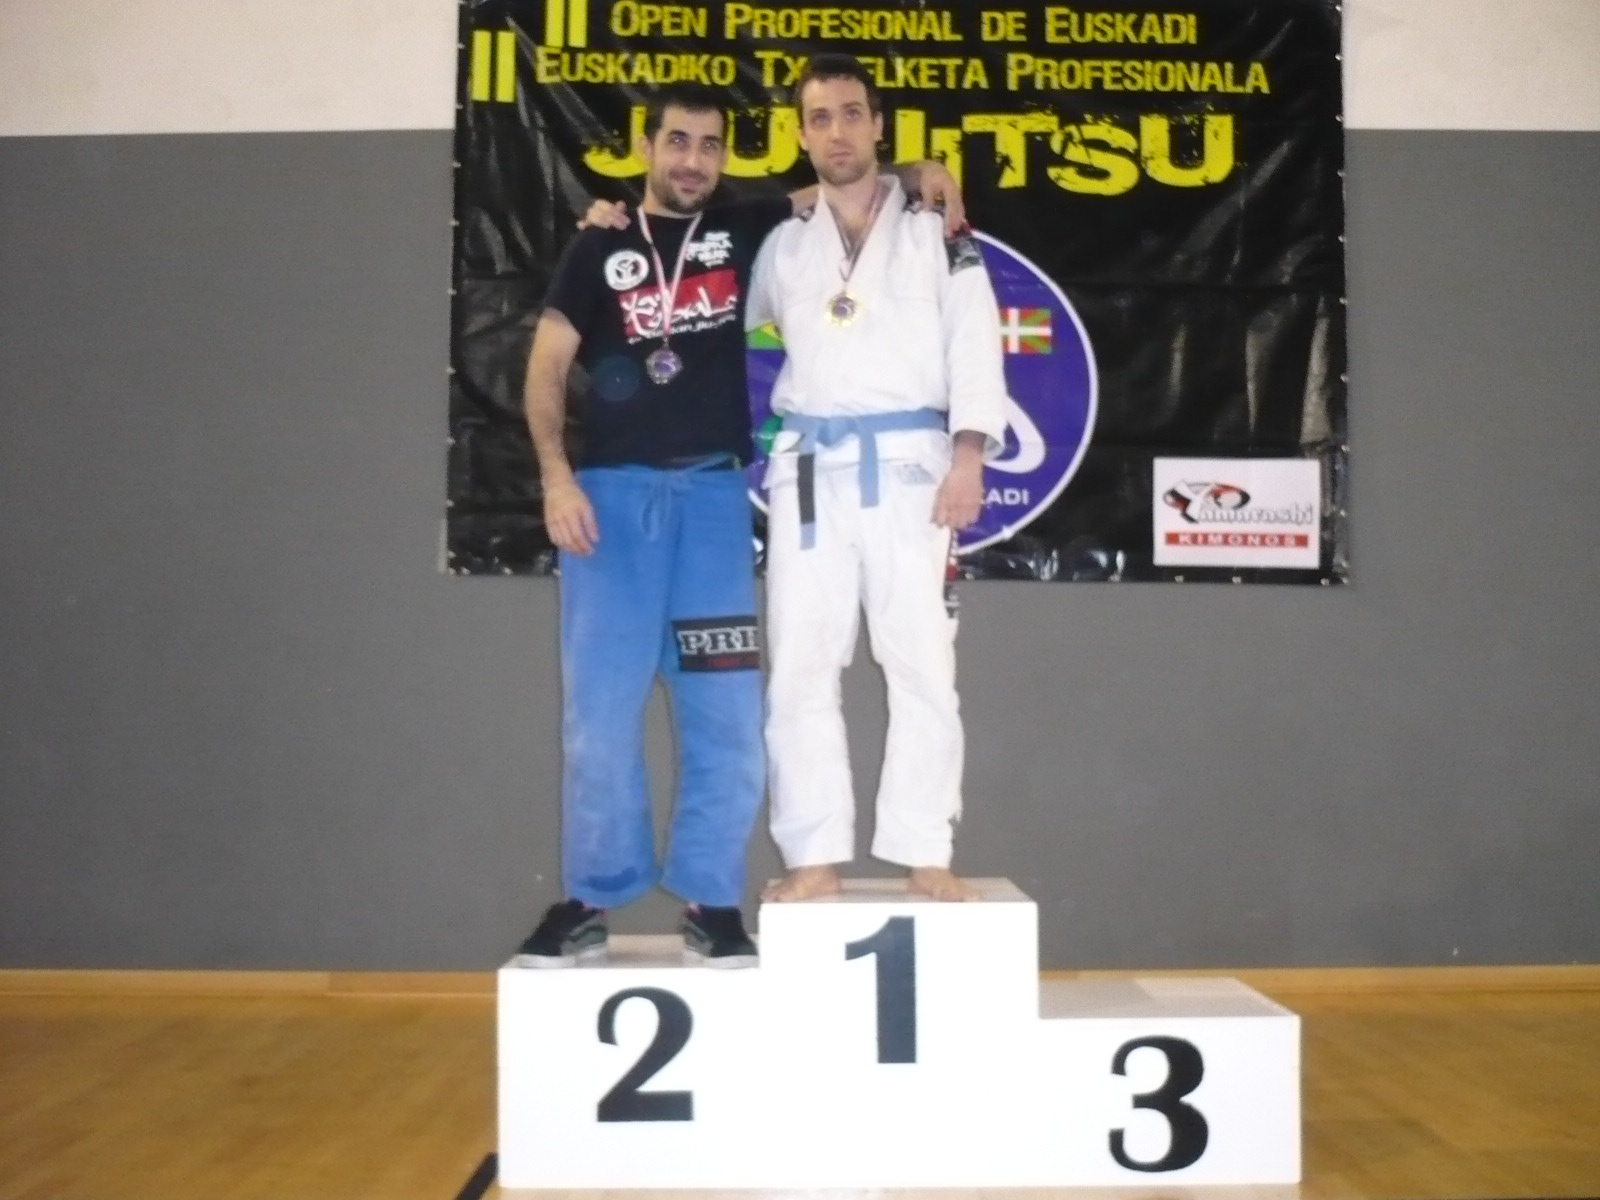 Raul Poza 'Ninja' en el podio